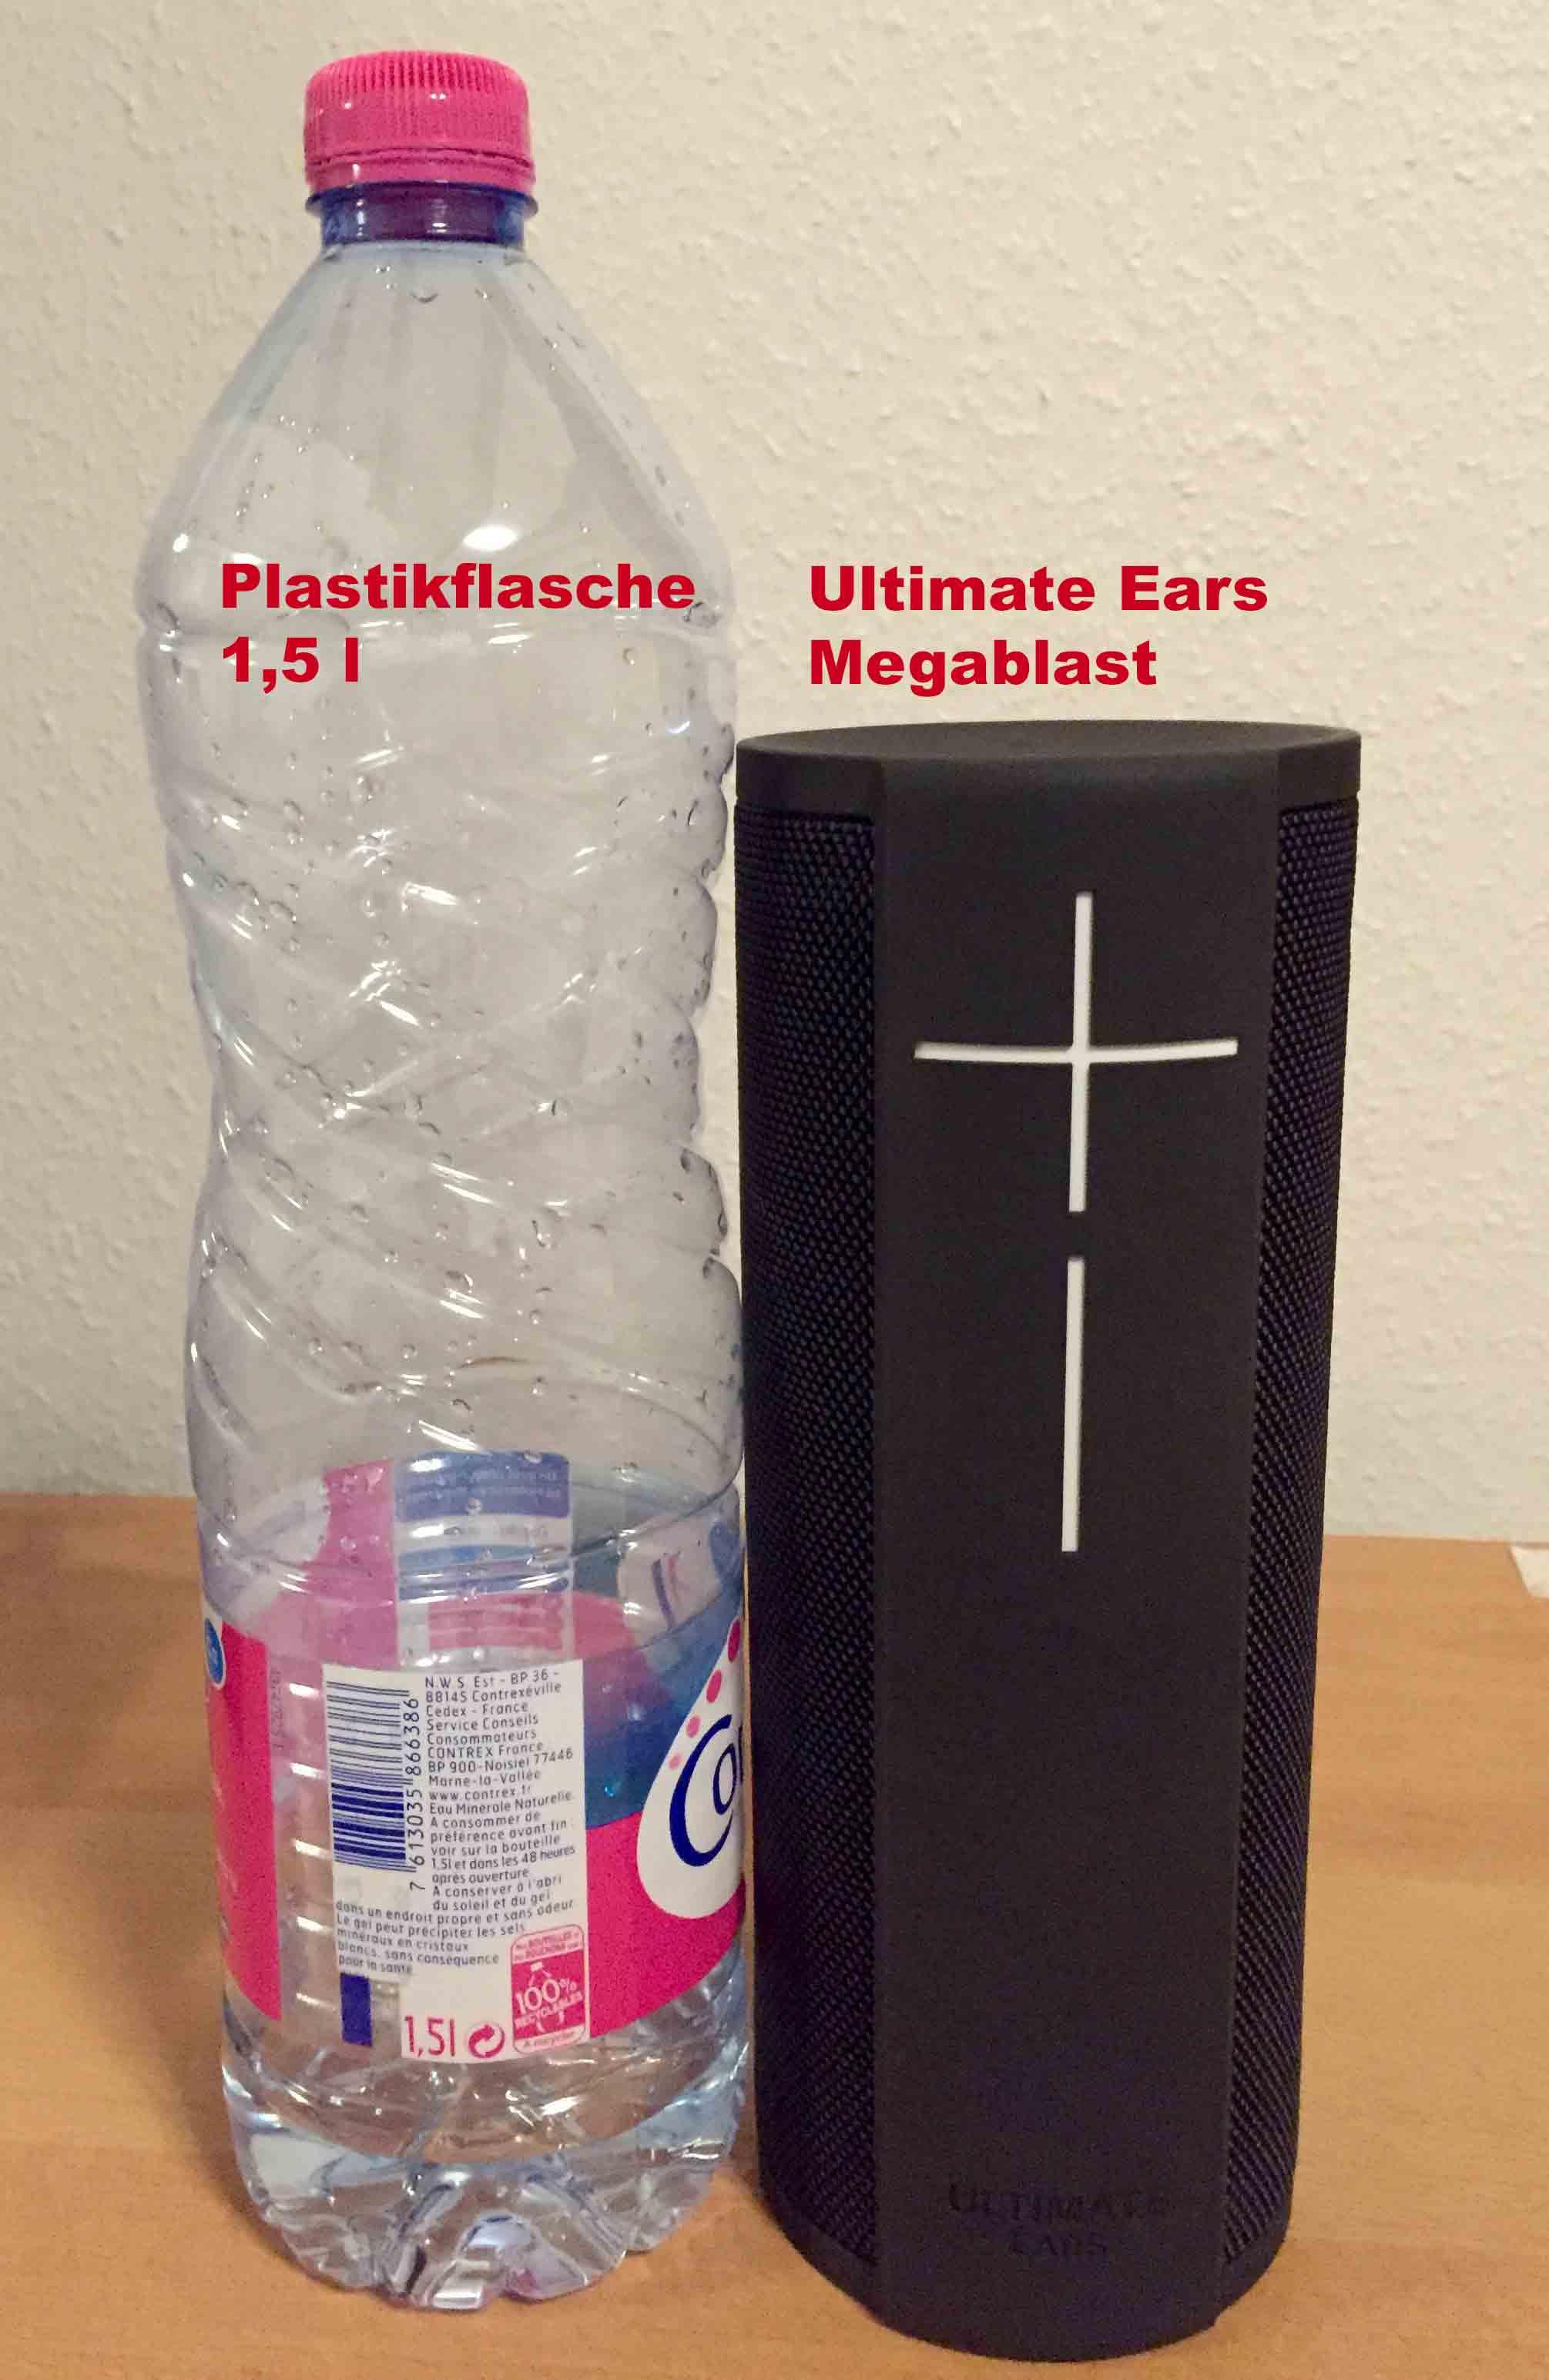 Ultimate Ears Megablast Grössen Vergleich